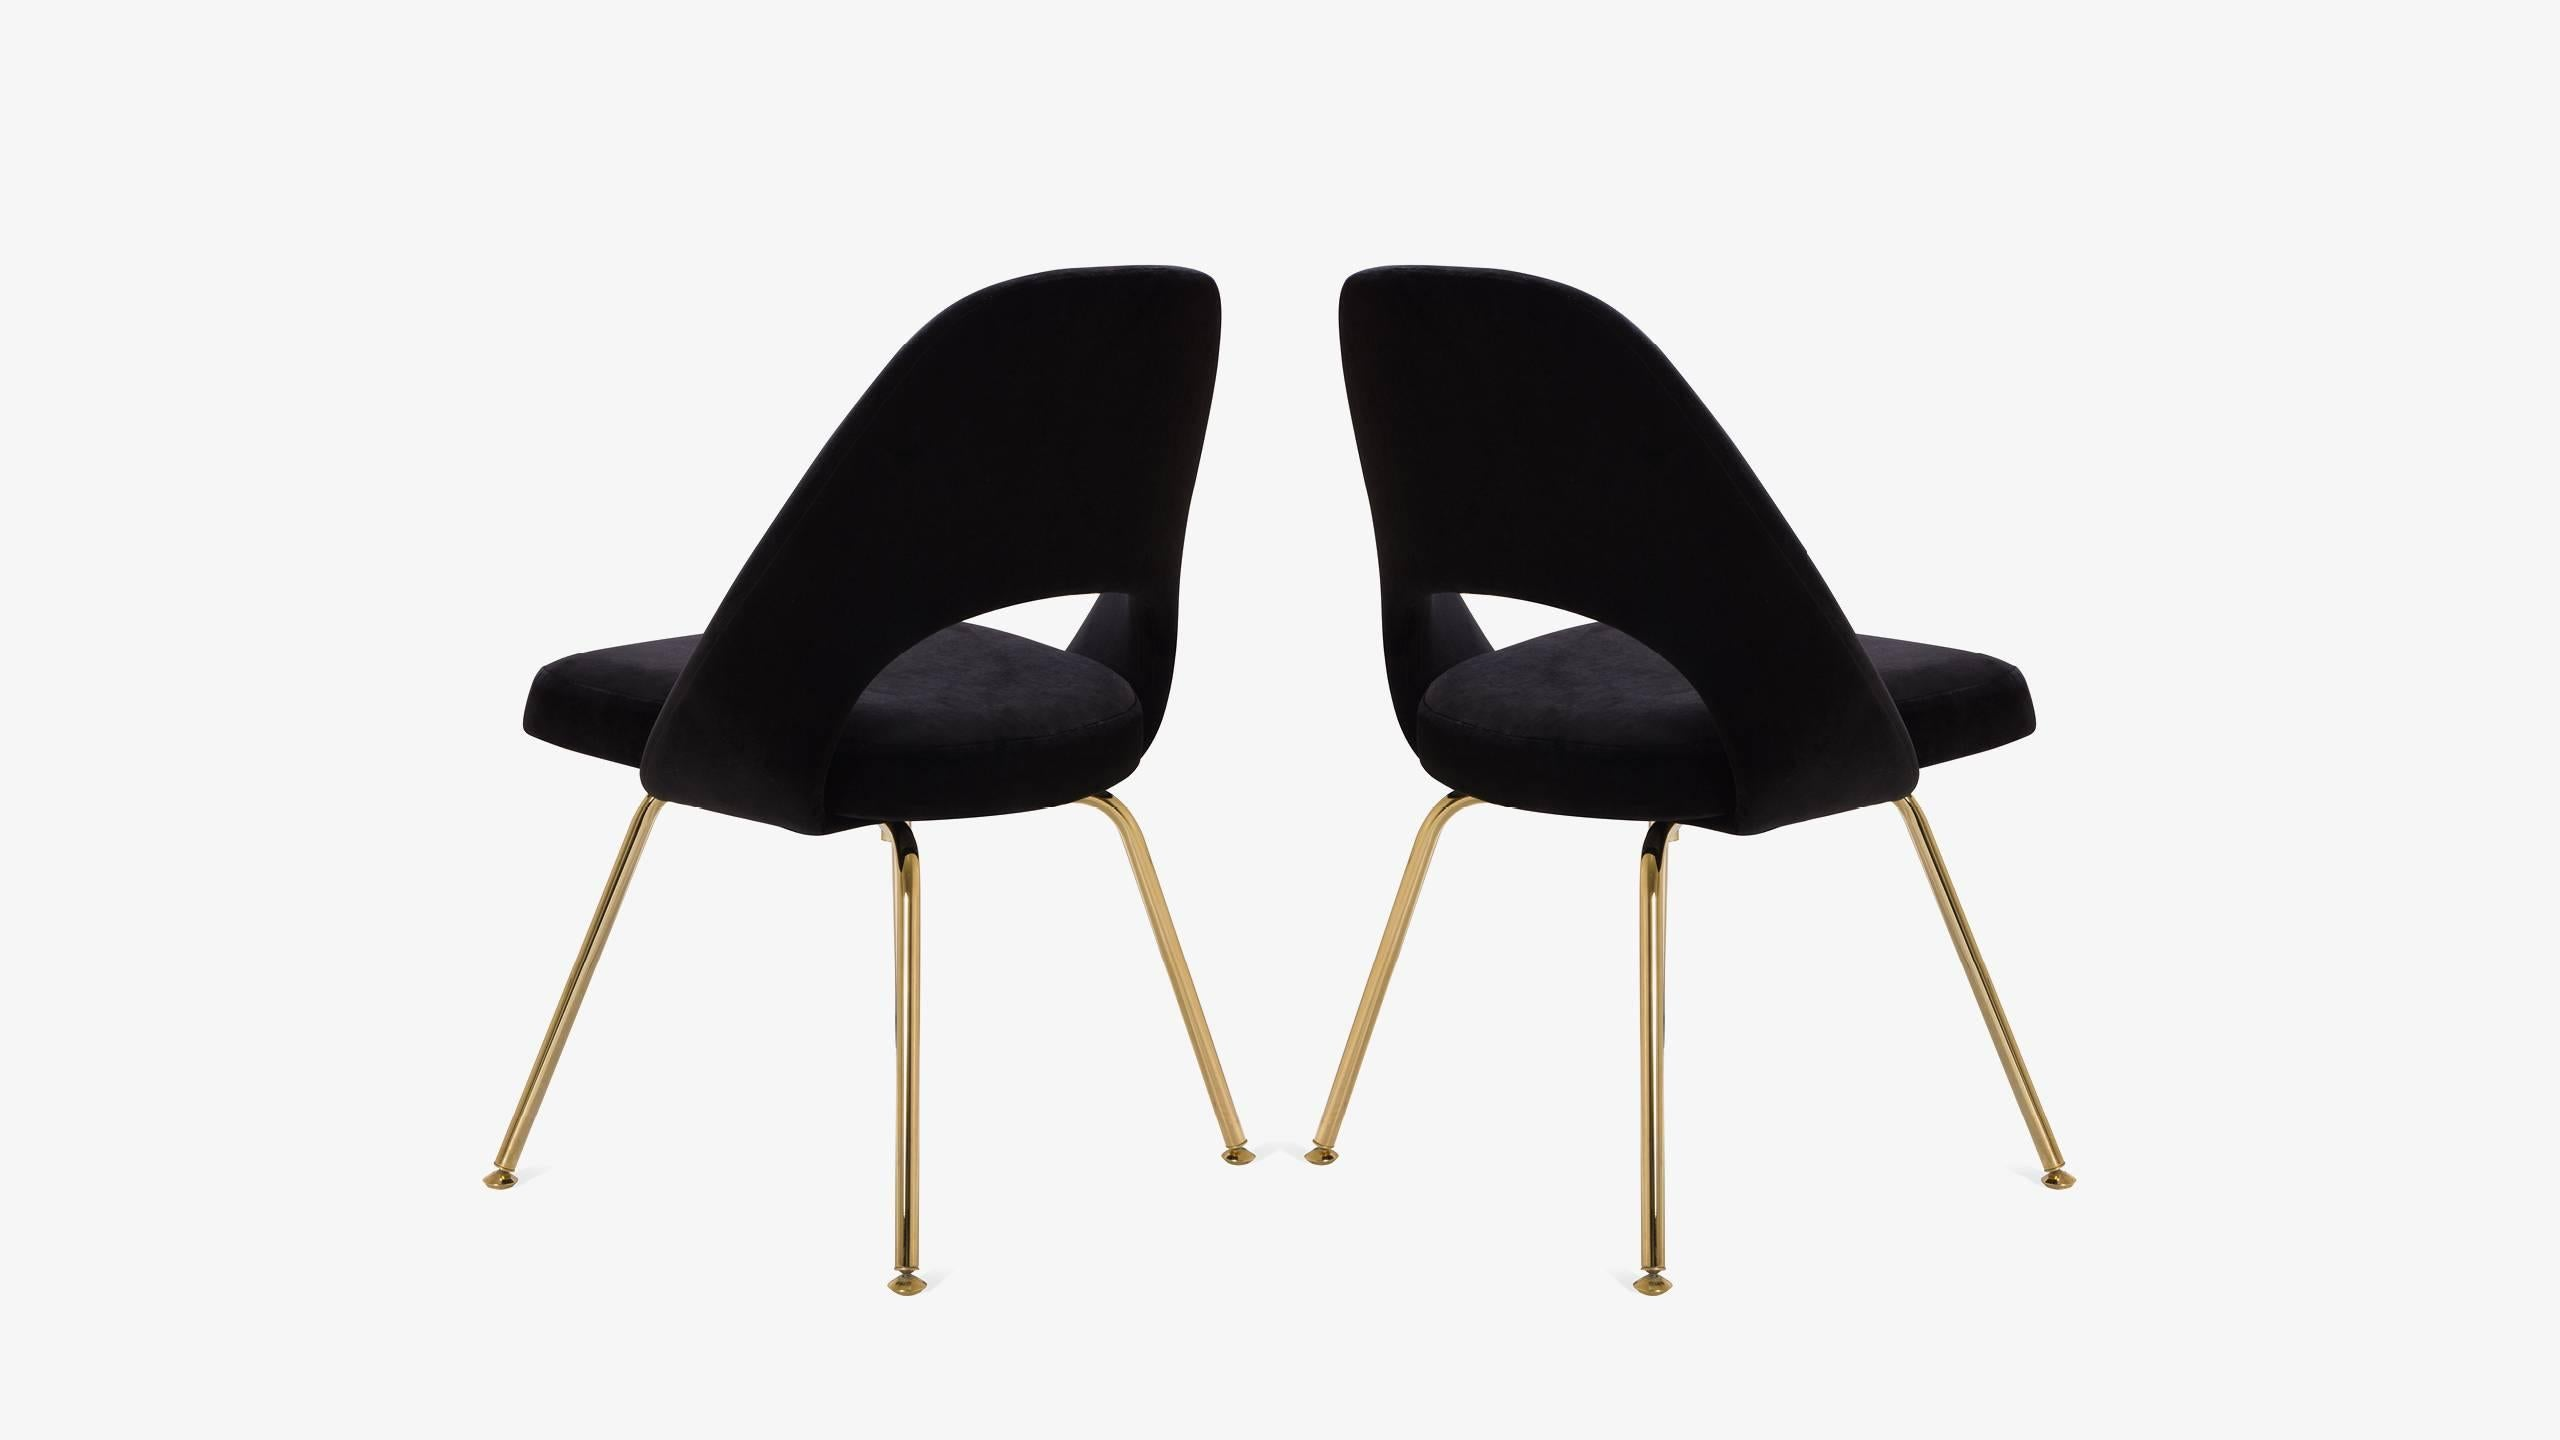 saarinen executive armless chairs in noir velvet 24k gold edition